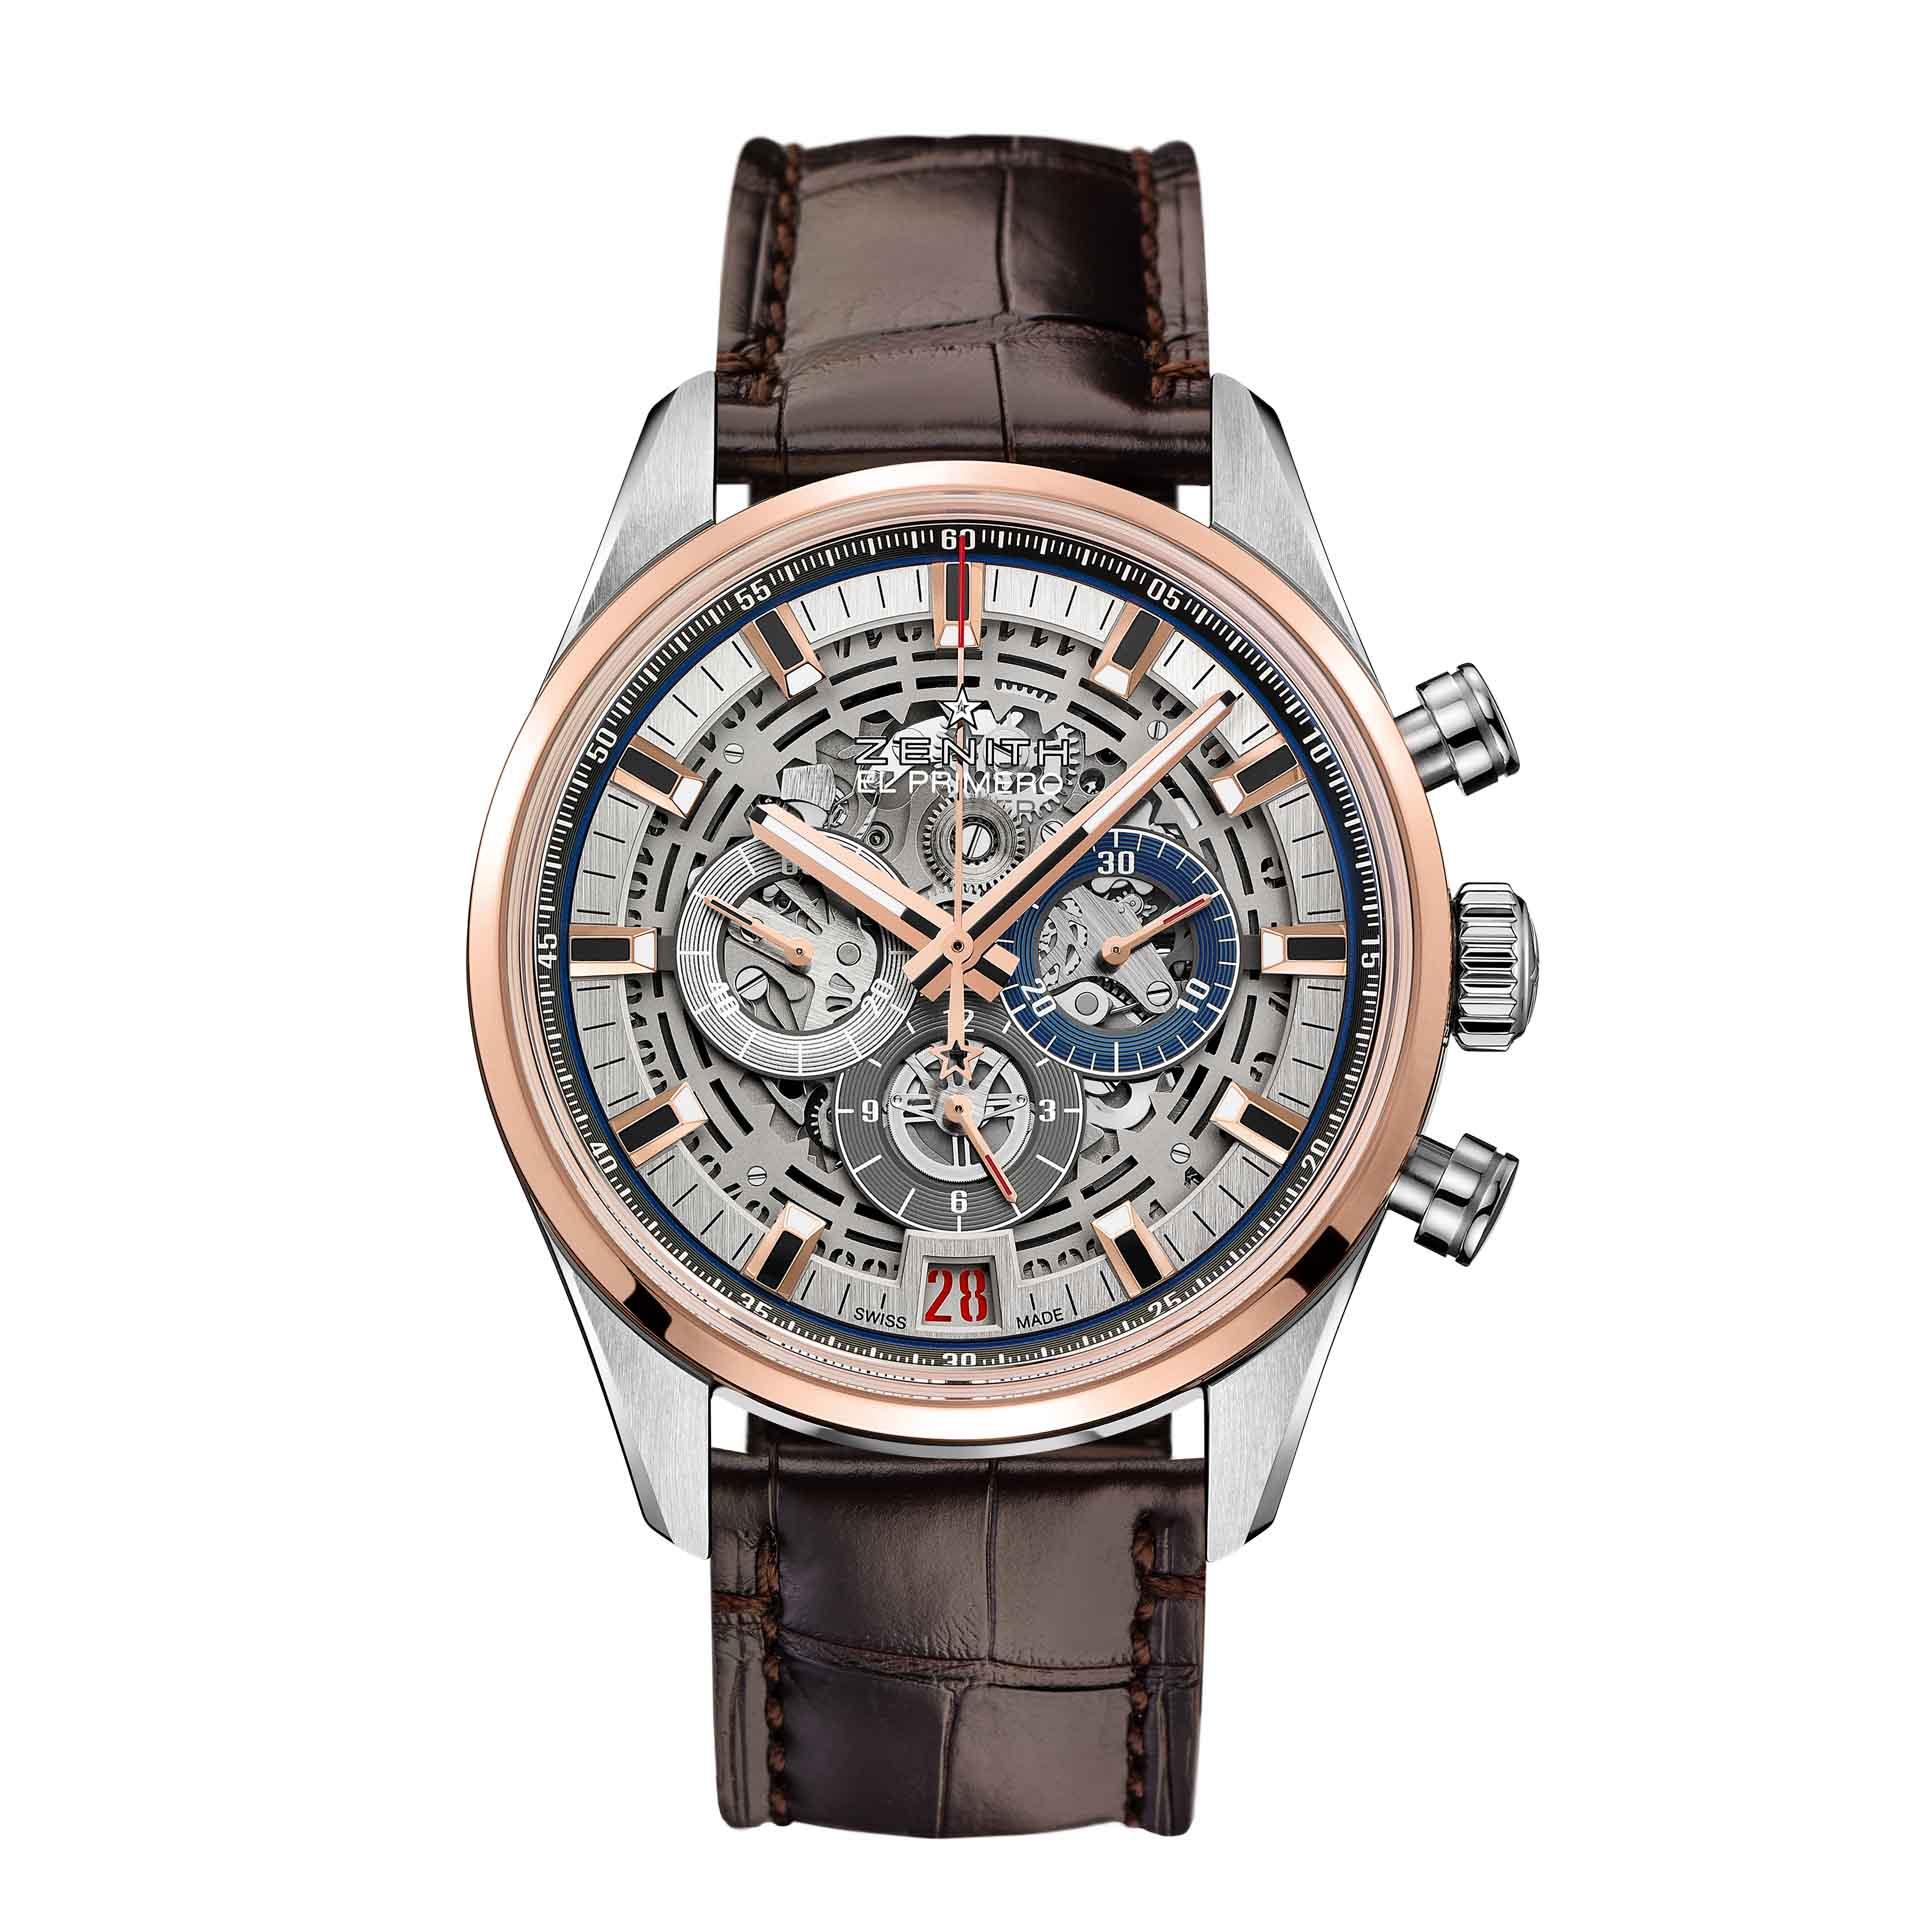 Zenith Chronomaster El Primero Full Open Your Watch Hub